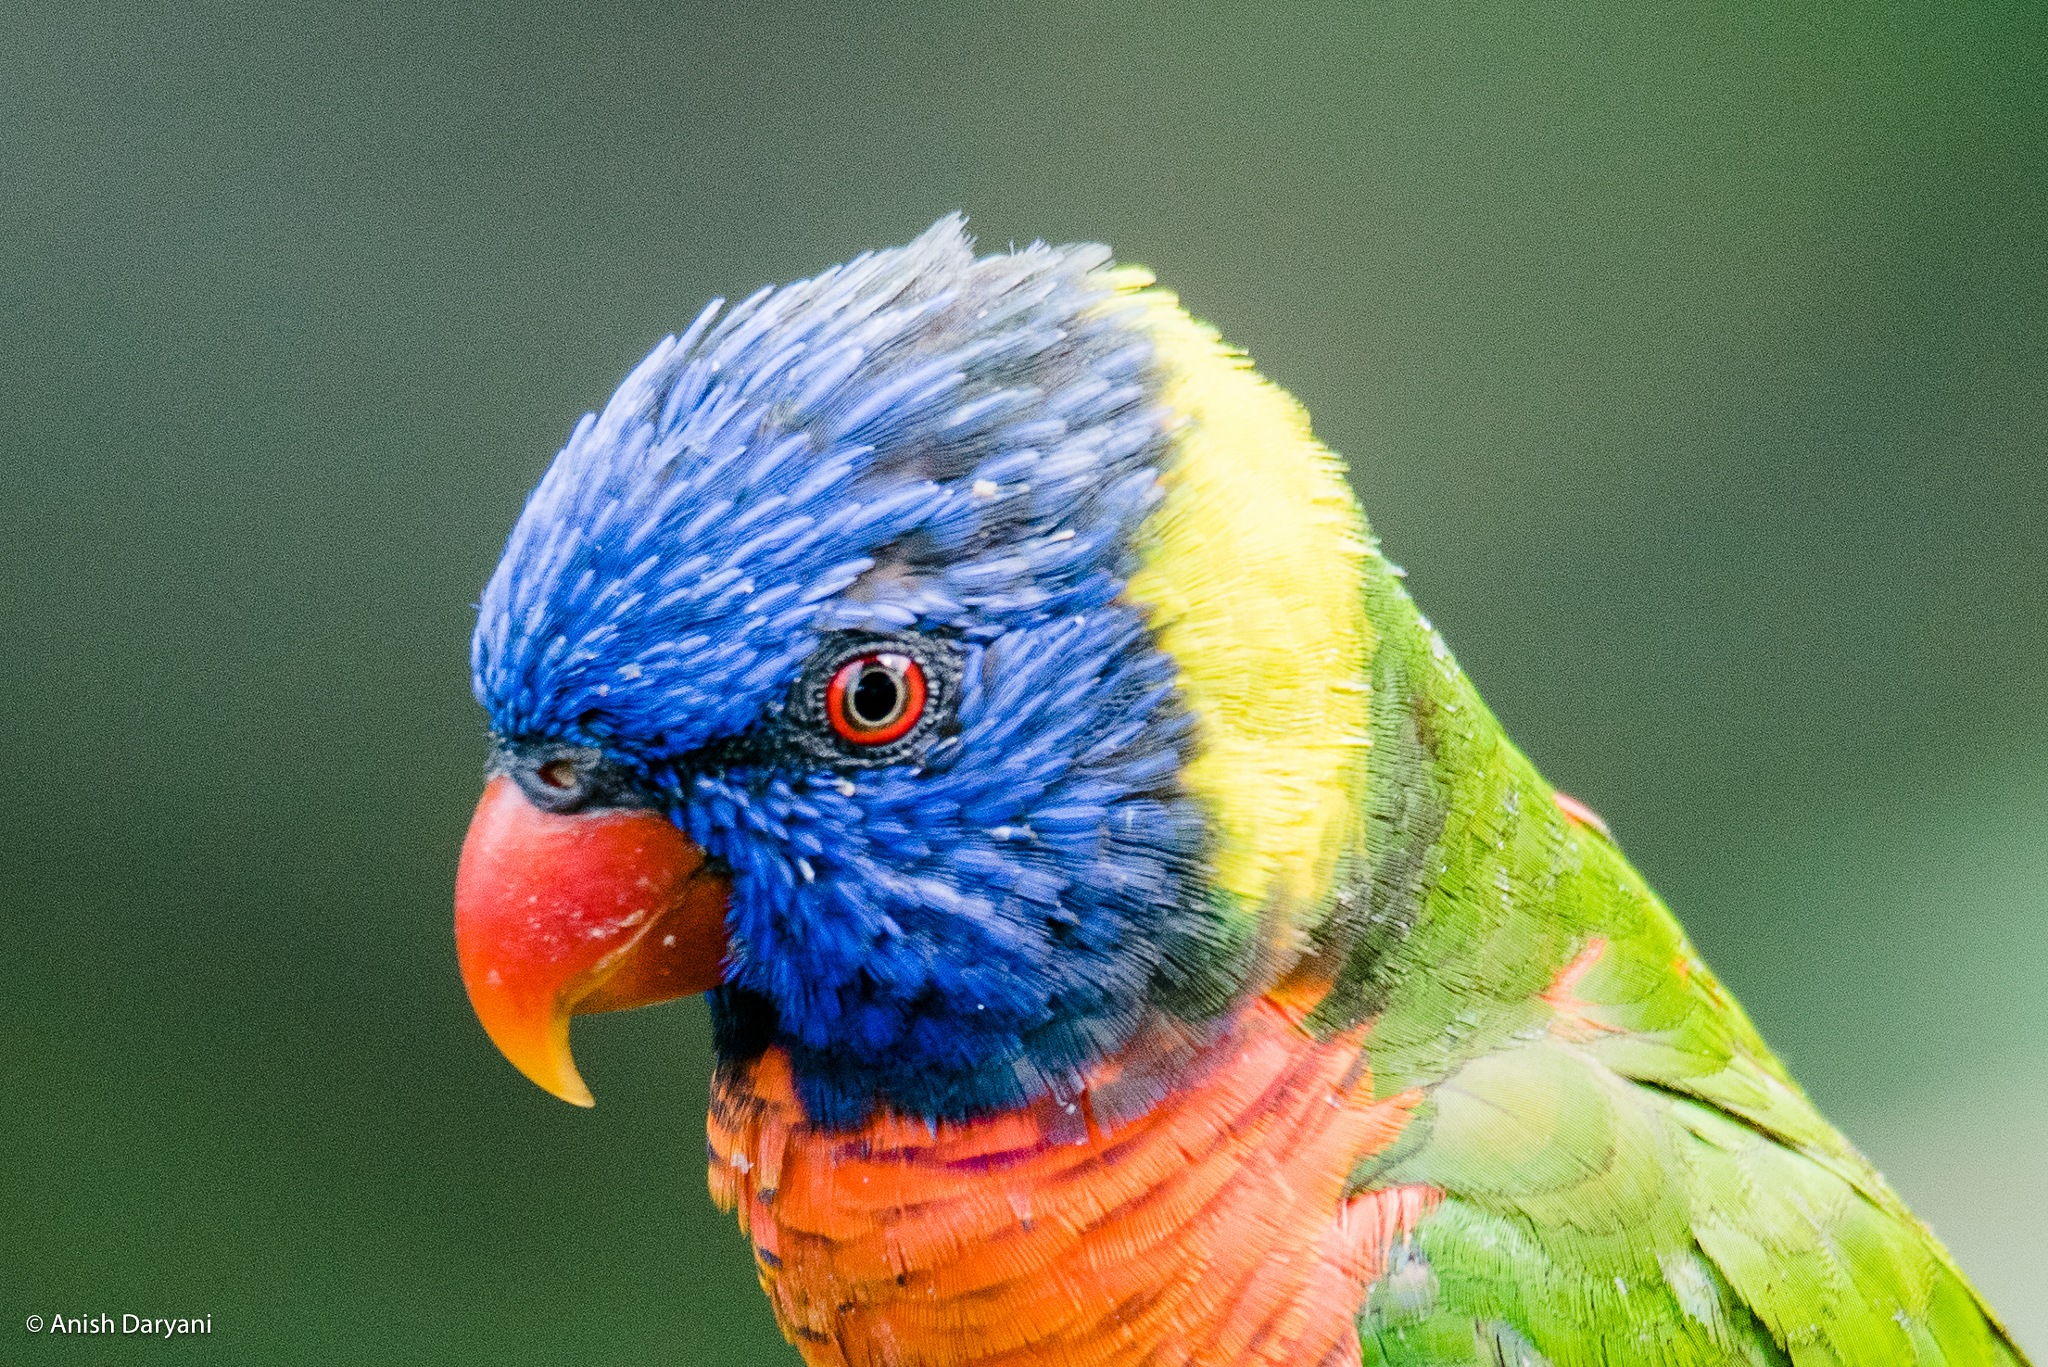 Rainbow with Wings by Anish Daryani